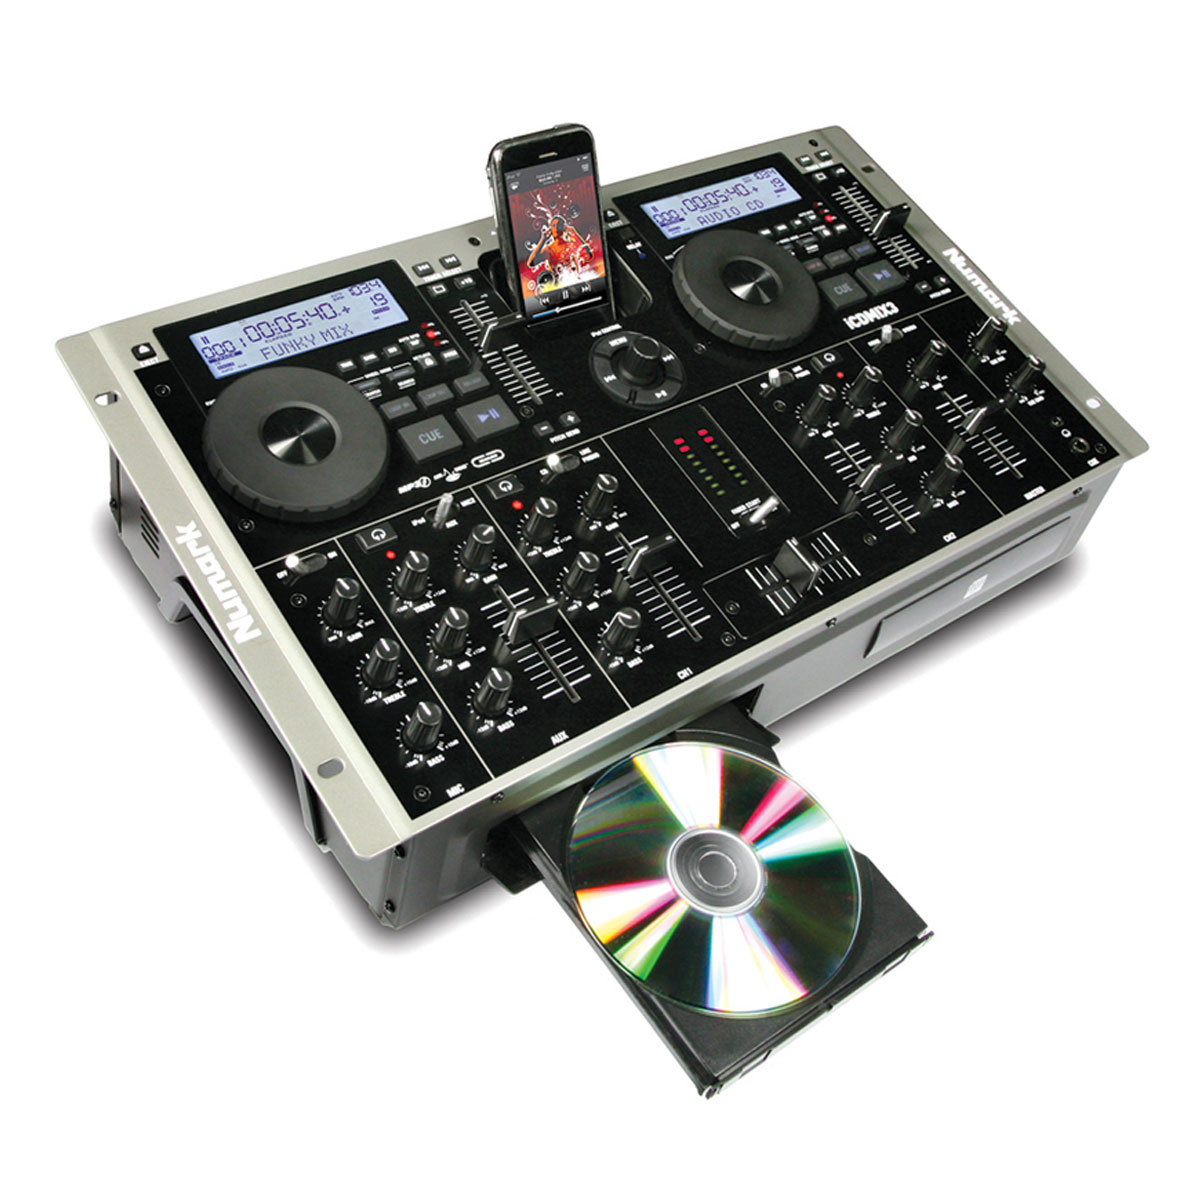 iCDMIX3 - CDJ Player Duplo c/ Dock p/ iPod iCD MIX 3 - Numark